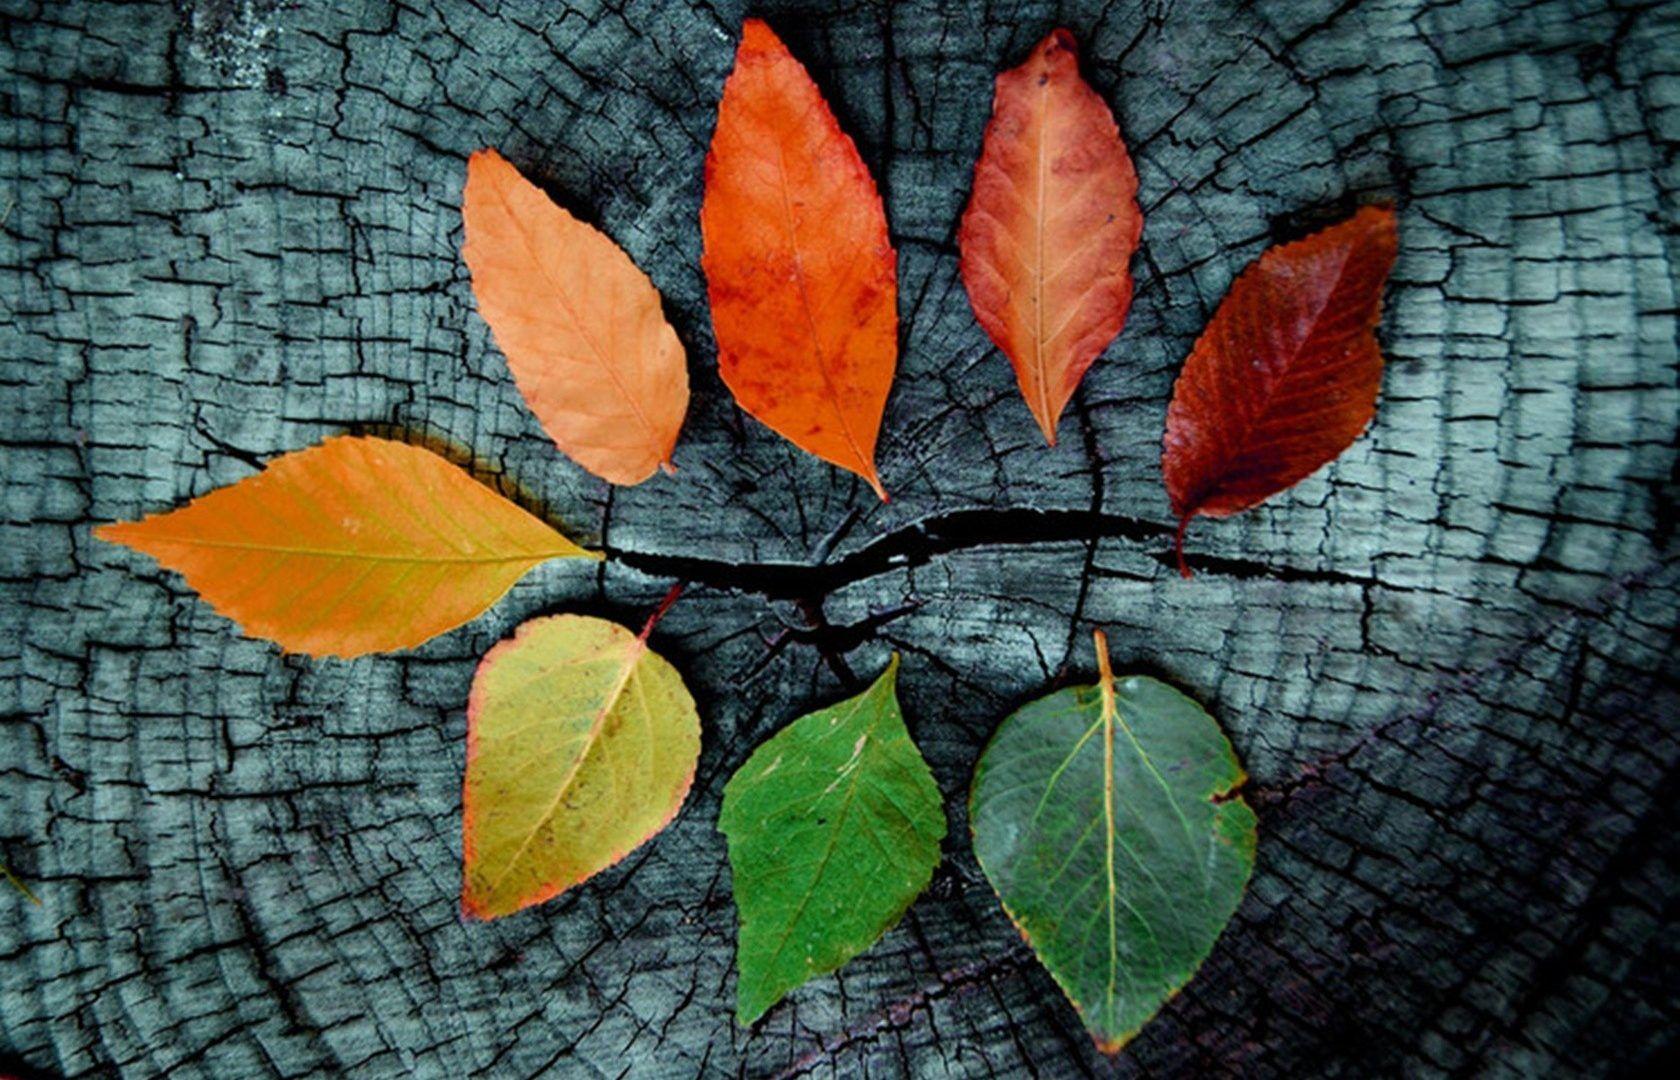 Fall Desktop Wallpaper Full Hd On Wallpaper 1080p Hd In 2020 Autumn Leaves Wallpaper Fall Wallpaper Winter Wallpaper Desktop